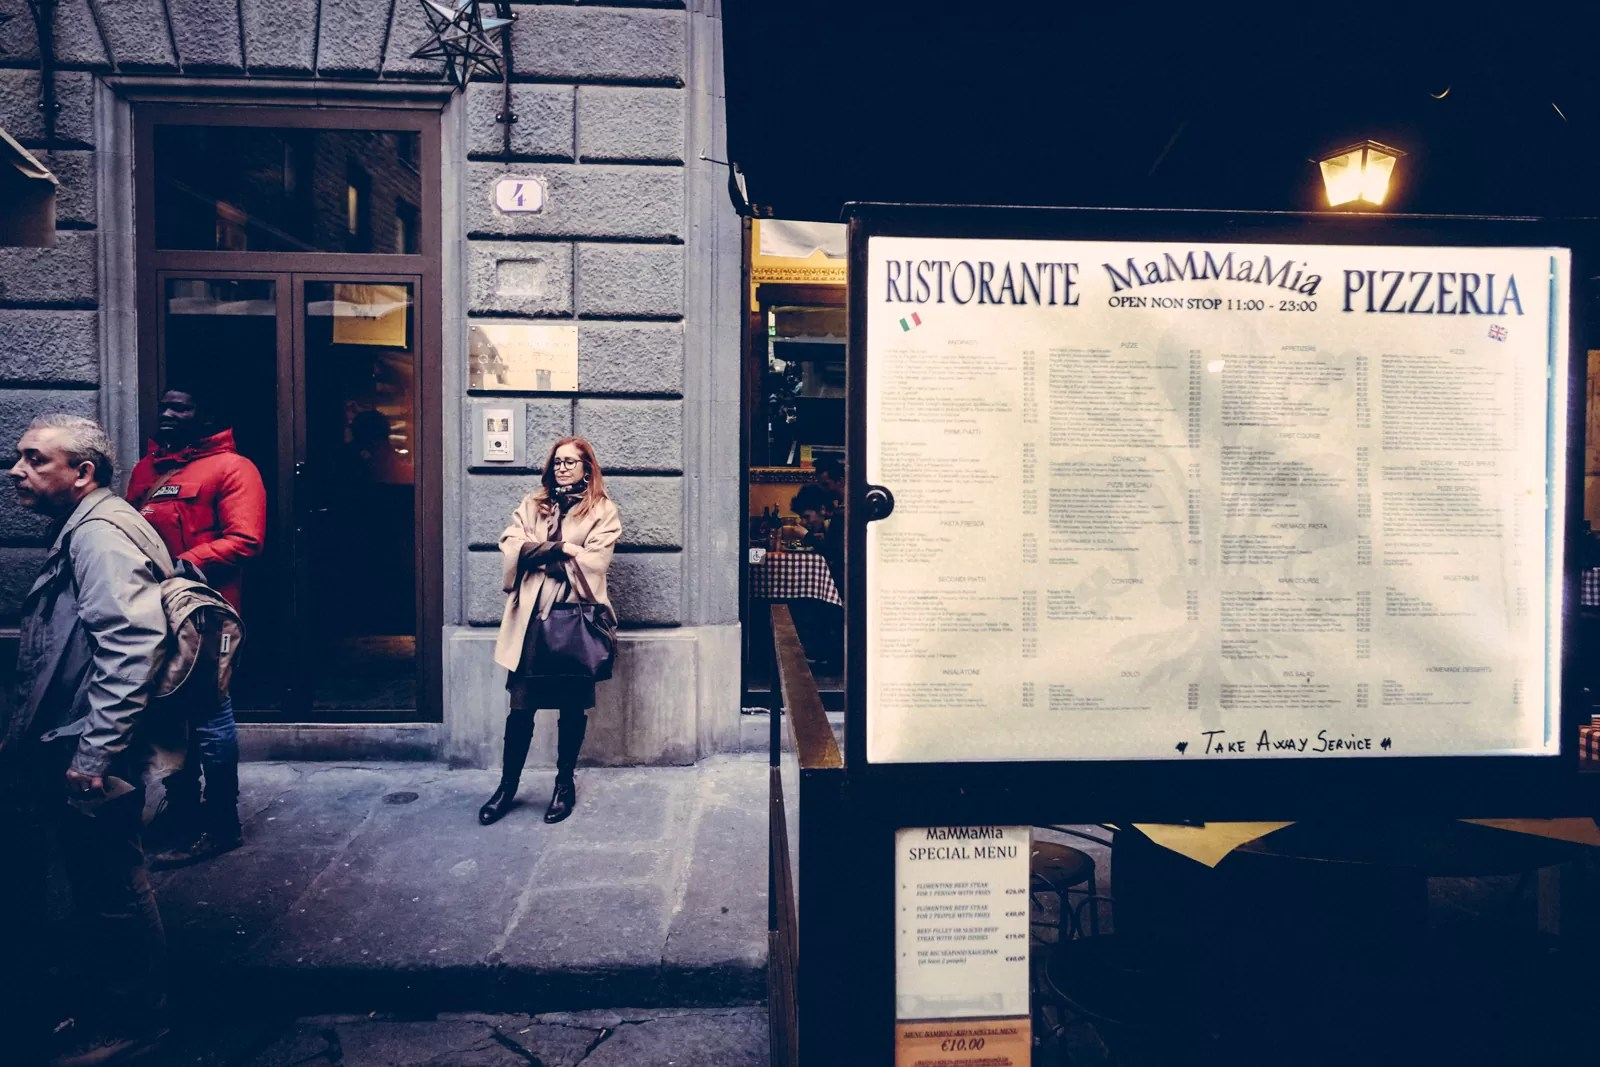 DSCF7778 - Foto fatte a c...? - Pensieri condivisi sulla street photography - fotostreet.it